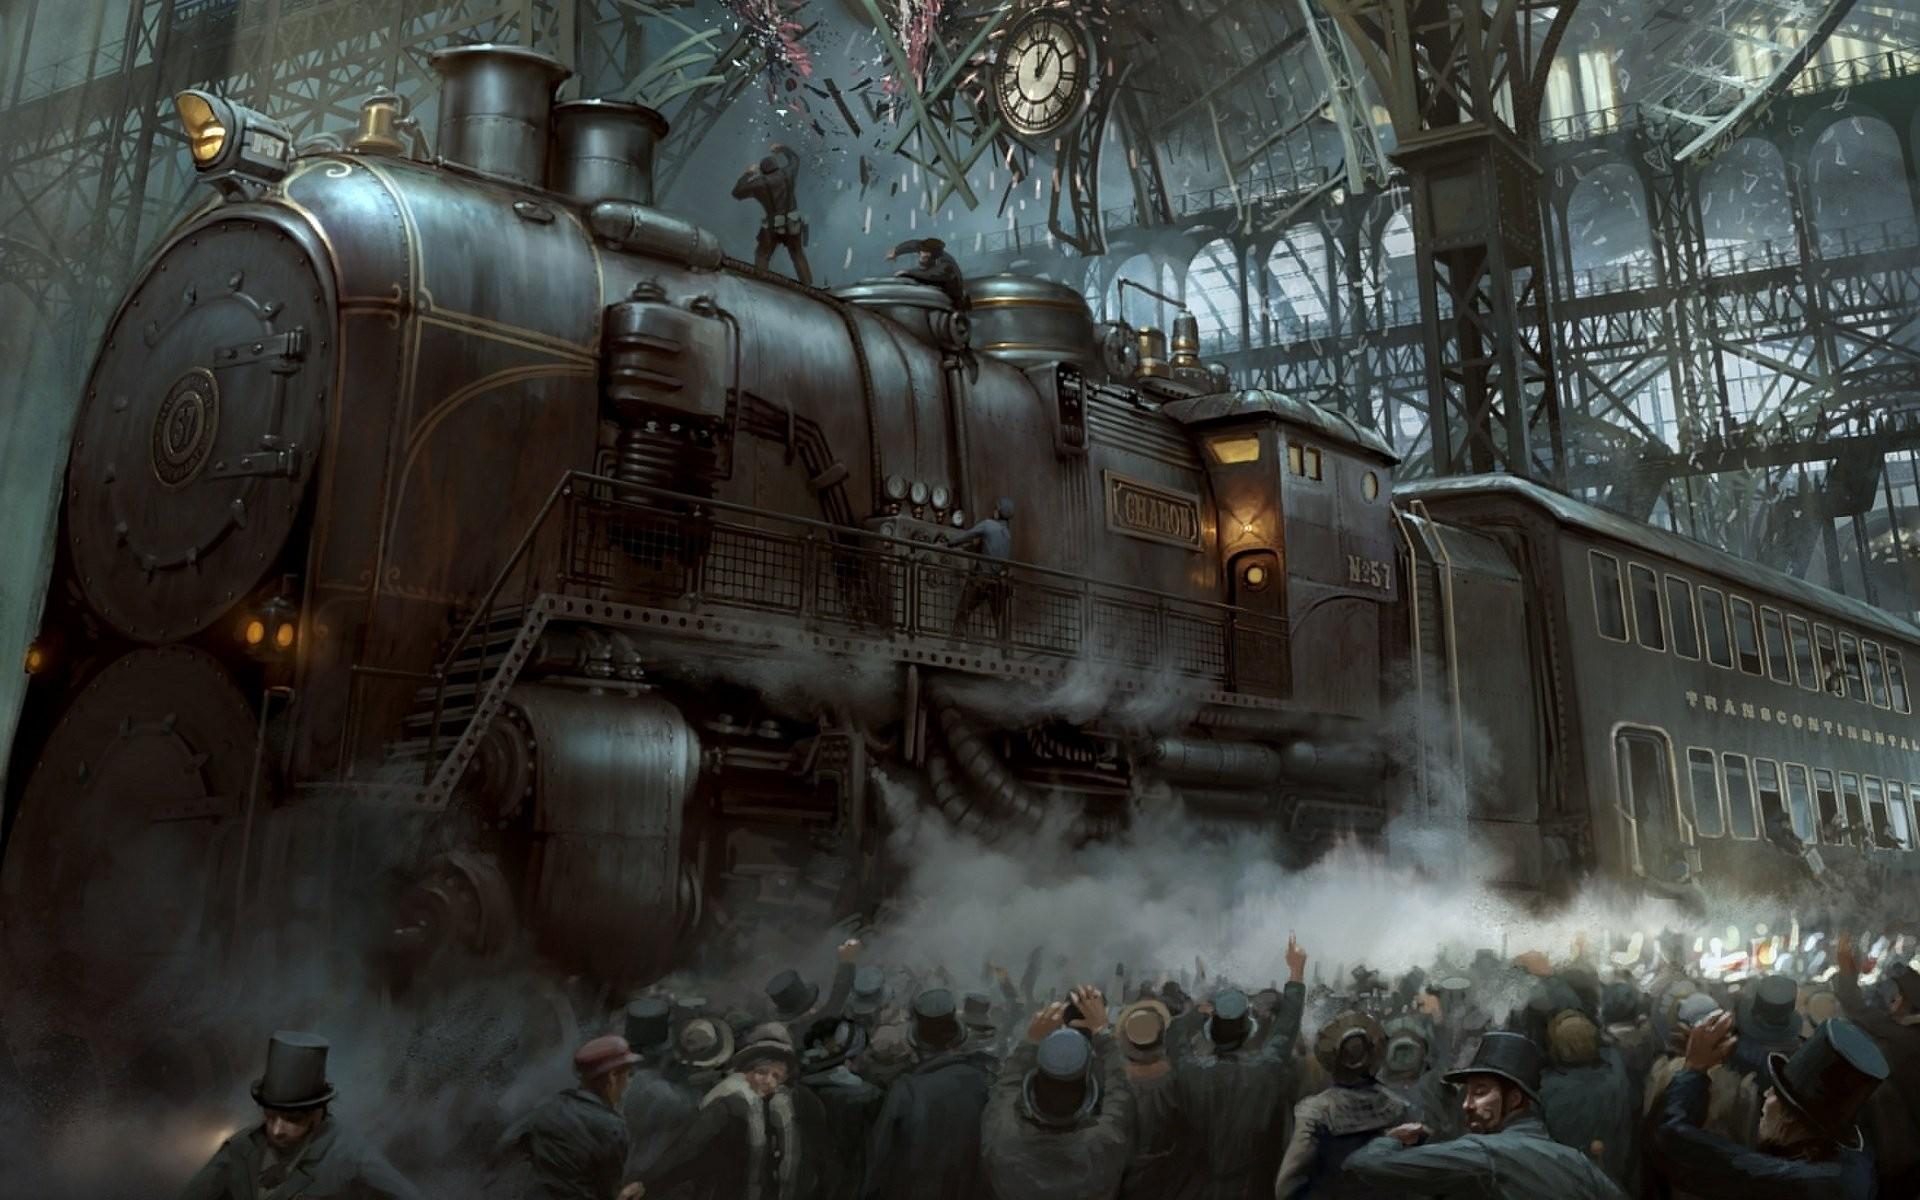 Steampunk wallpaper Download free HD backgrounds for desktop